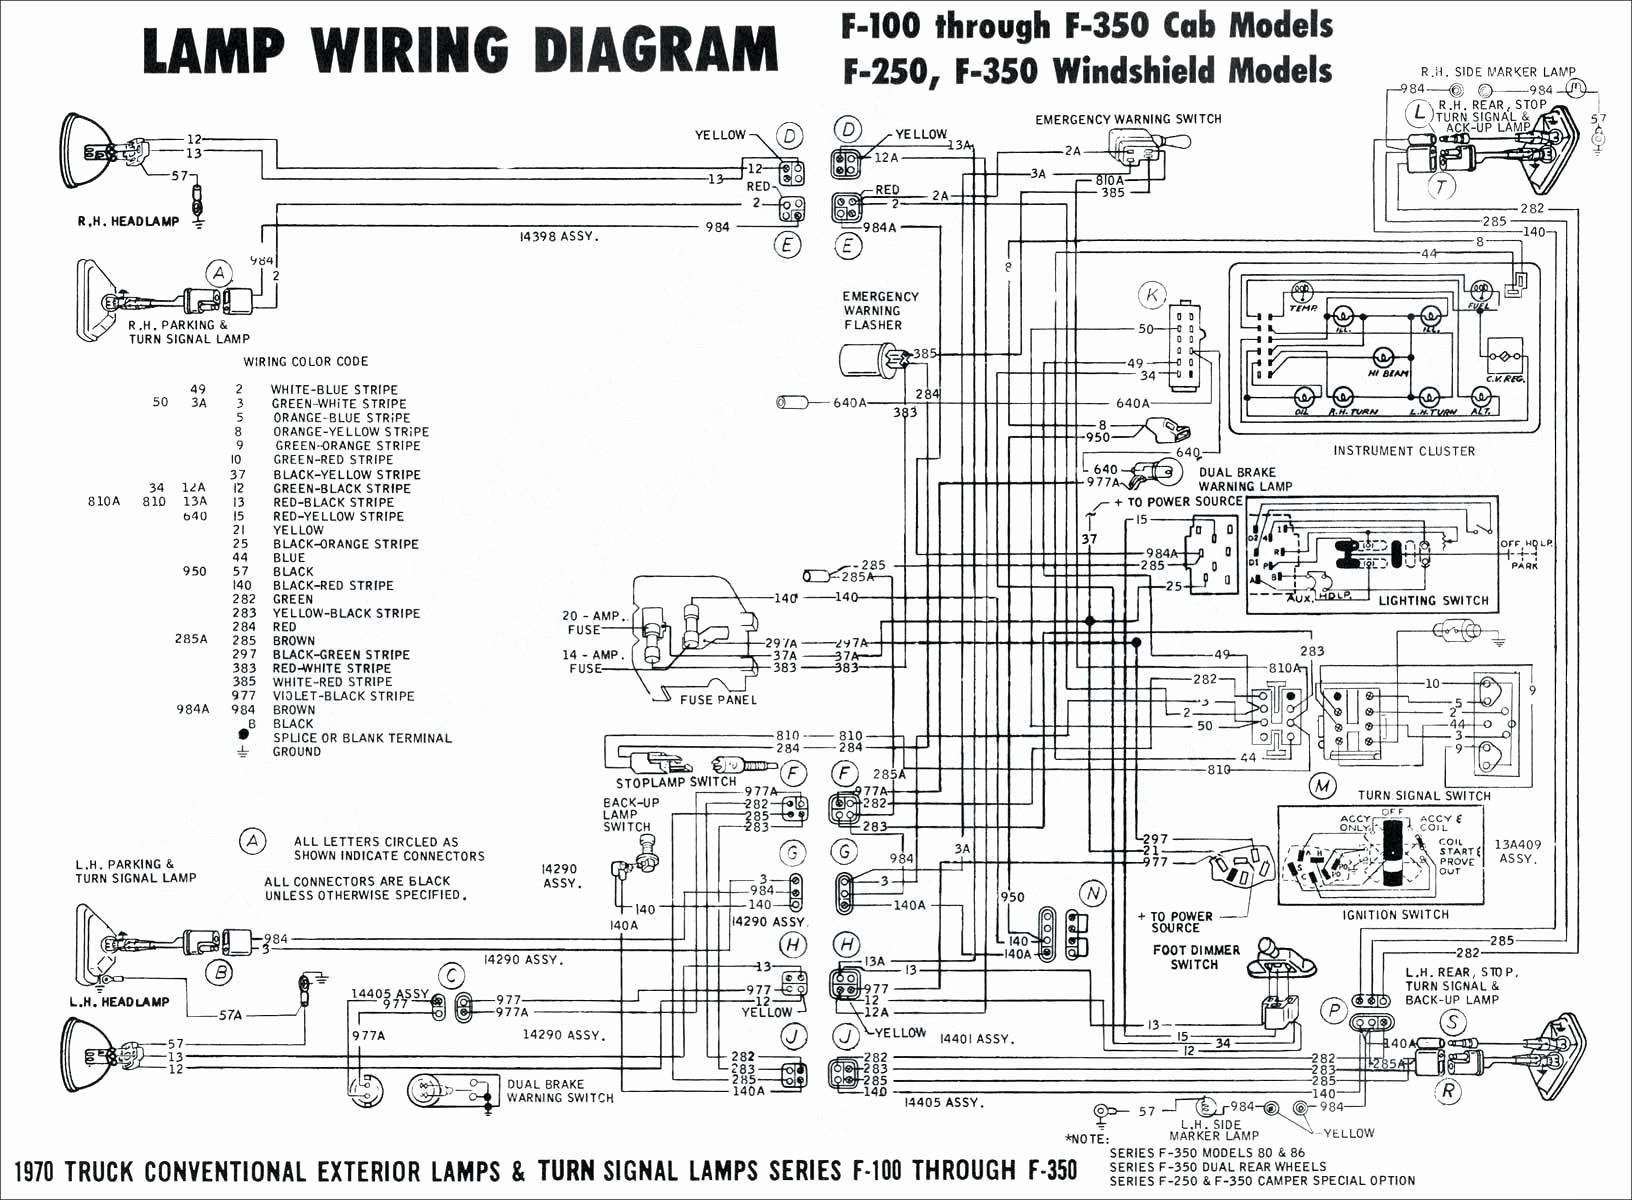 Corvette Vacuum Diagram On 1985 Corvette Engine Wire Harness Diagram